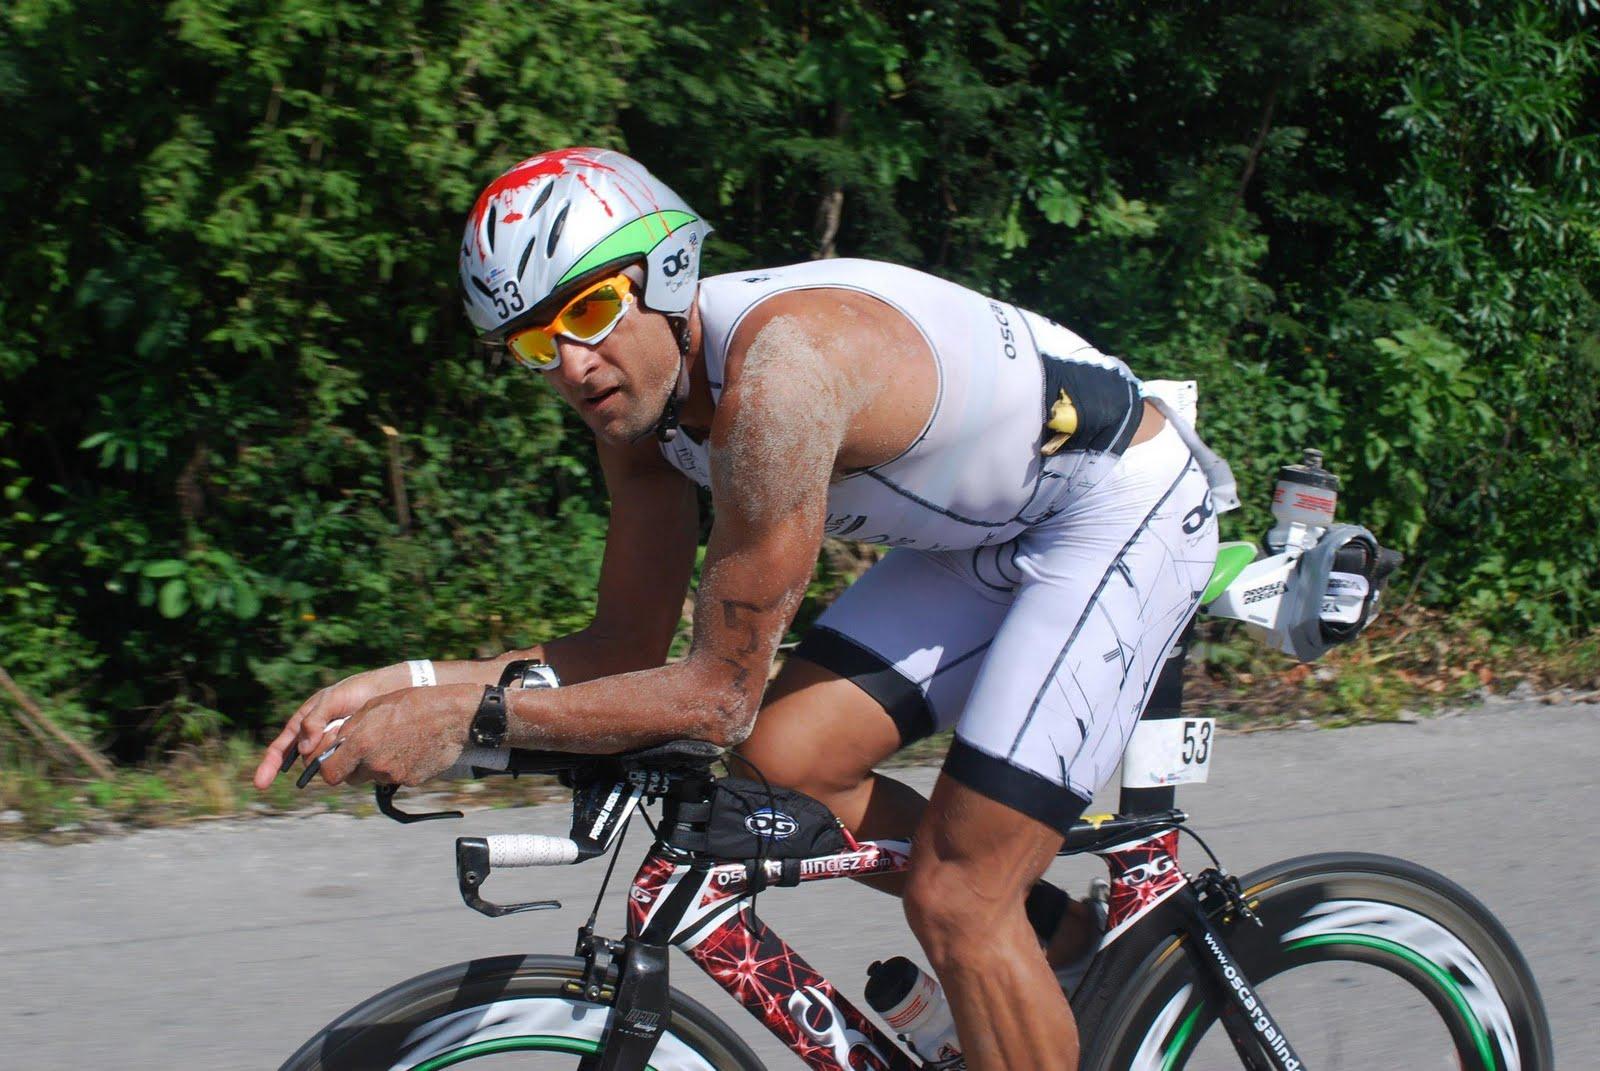 cc7fab3d8 En primera persona  Galindez y el Ironman de Cozumel